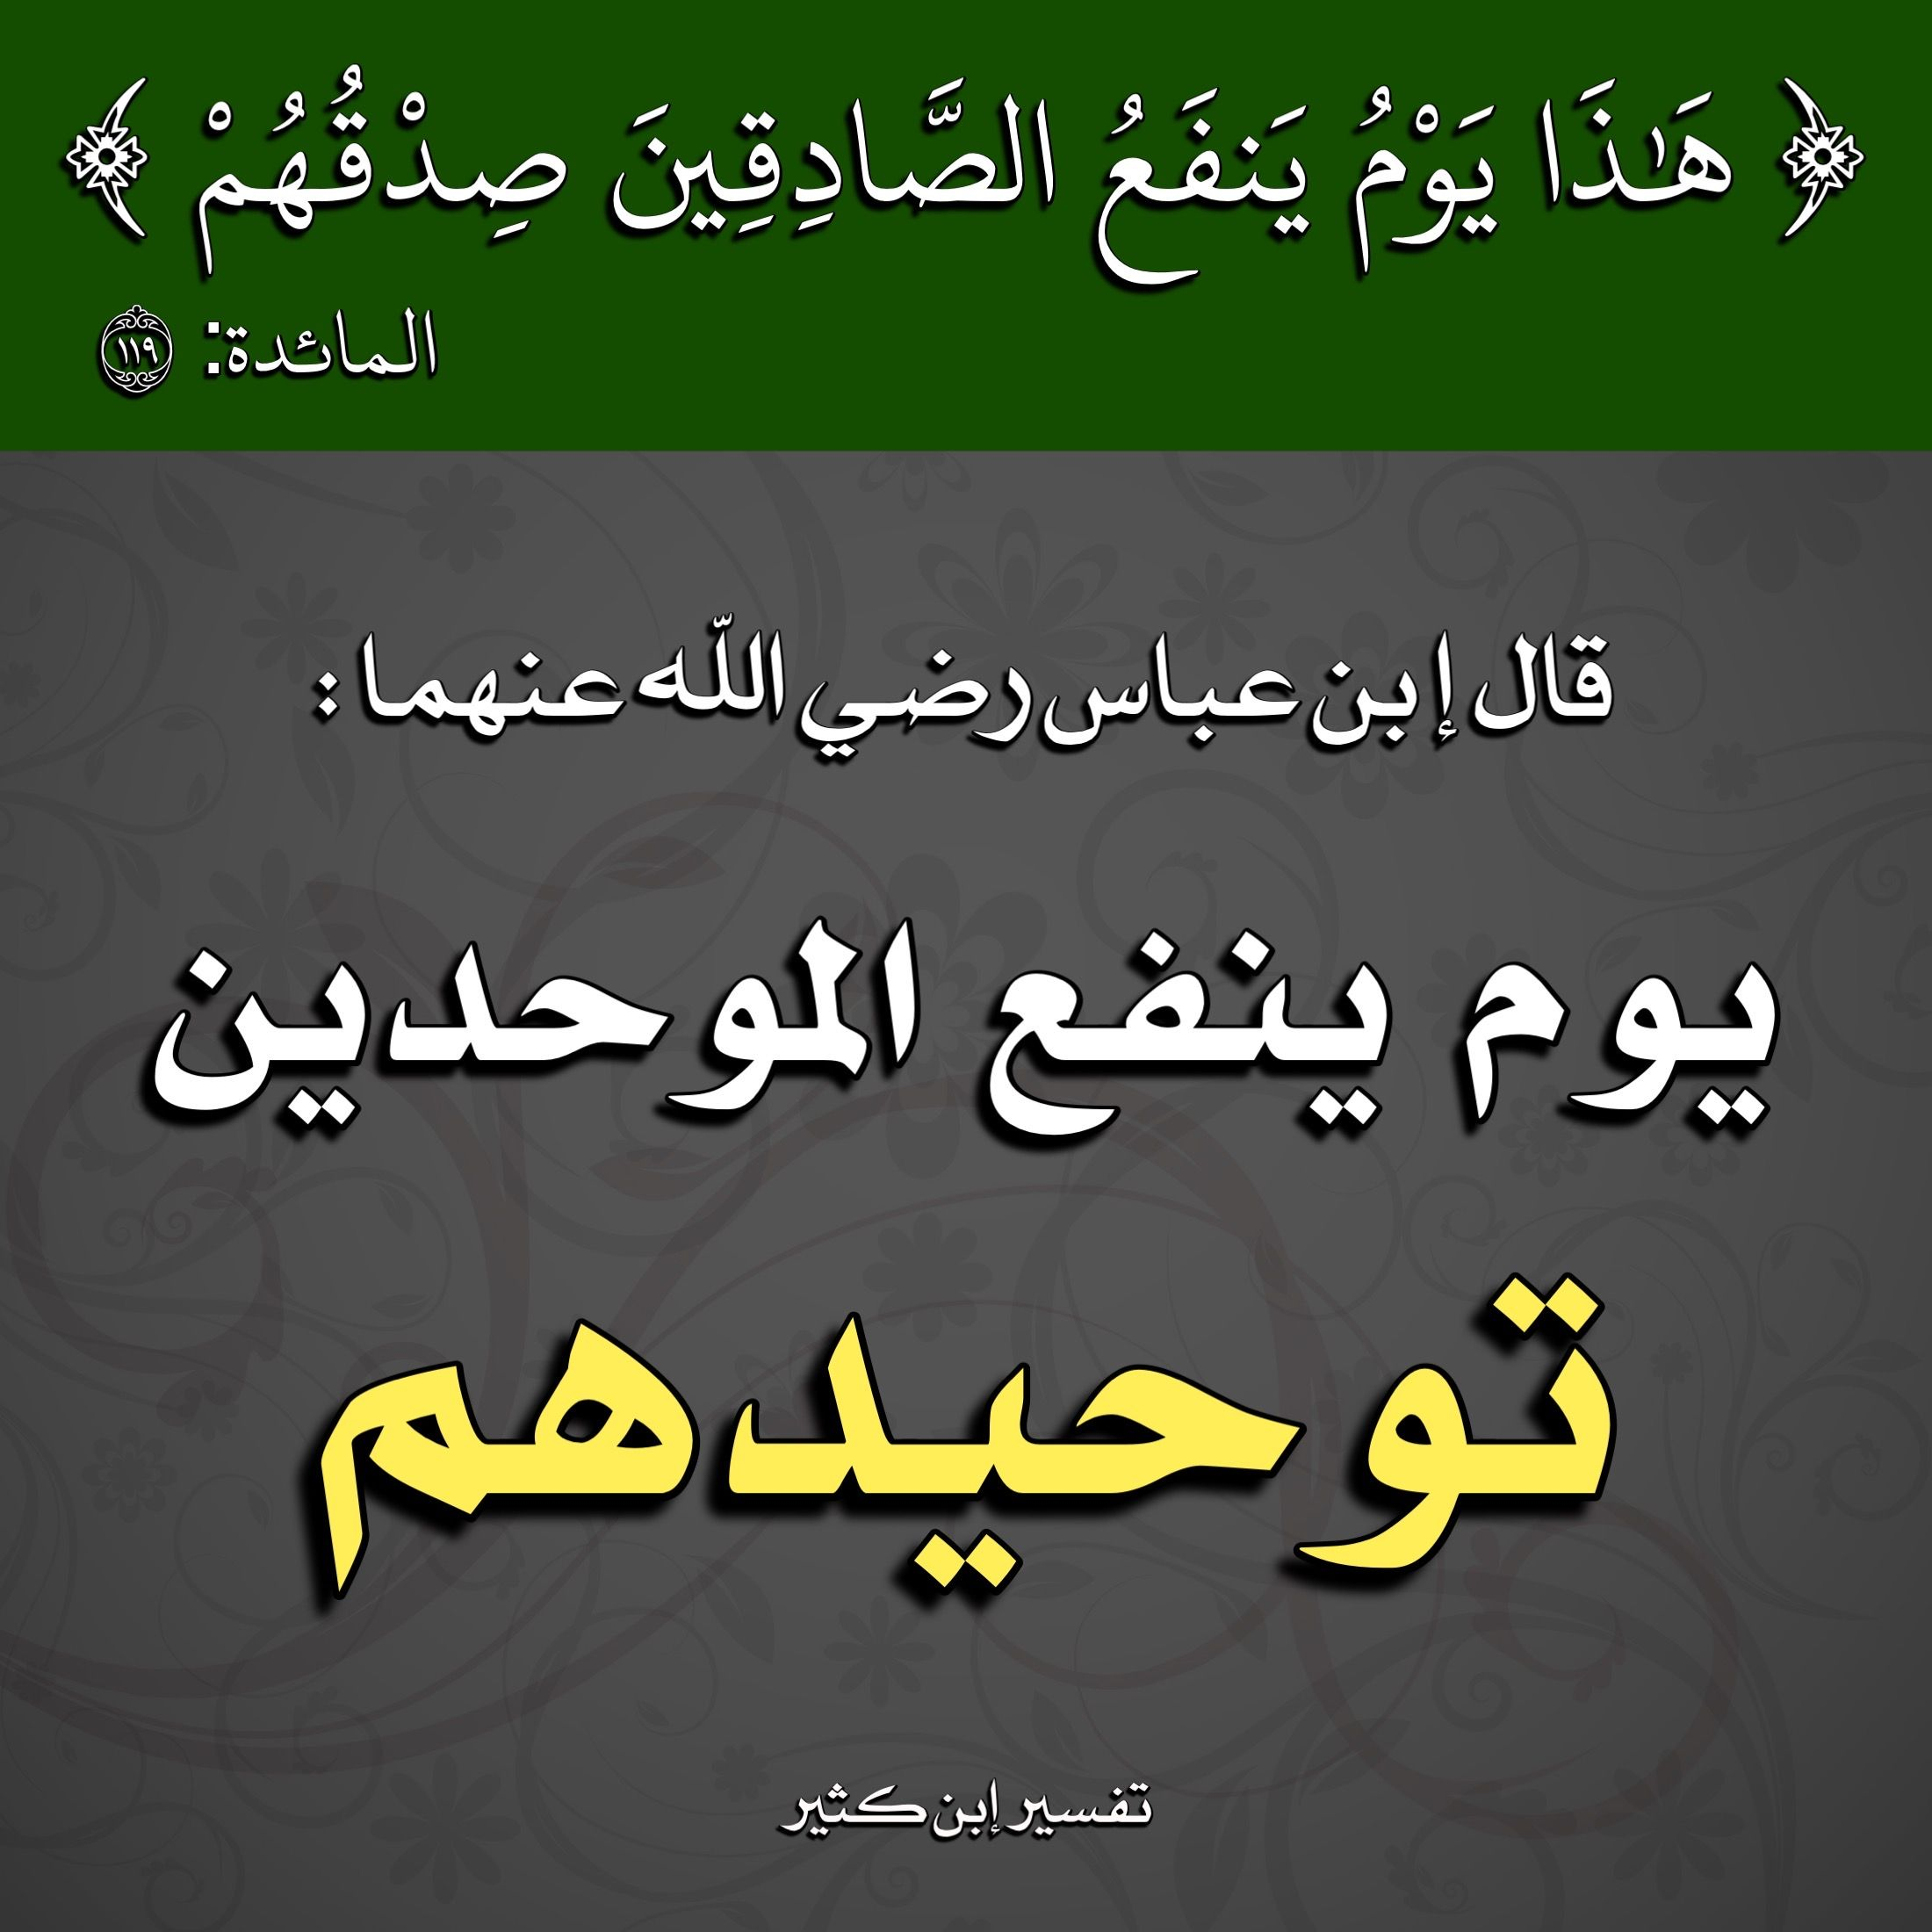 Pin By الأثر الجميل On آية وتفسير Islamic Quotes Tech Company Logos Quotes